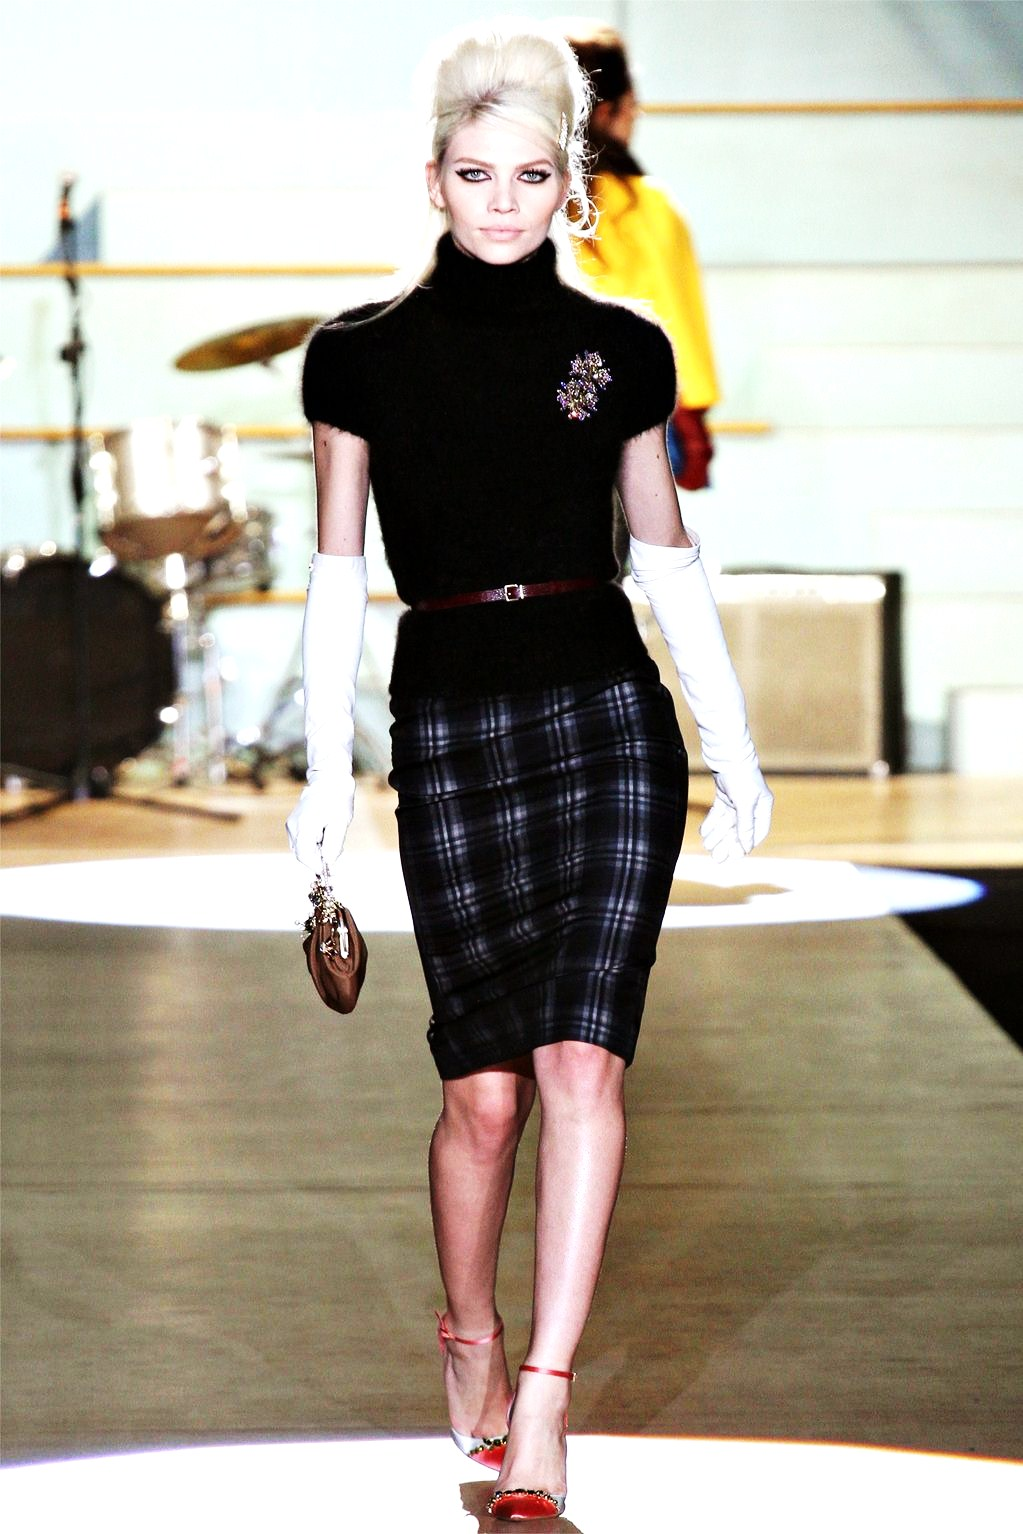 stylefash25 the pencil skirt rangers